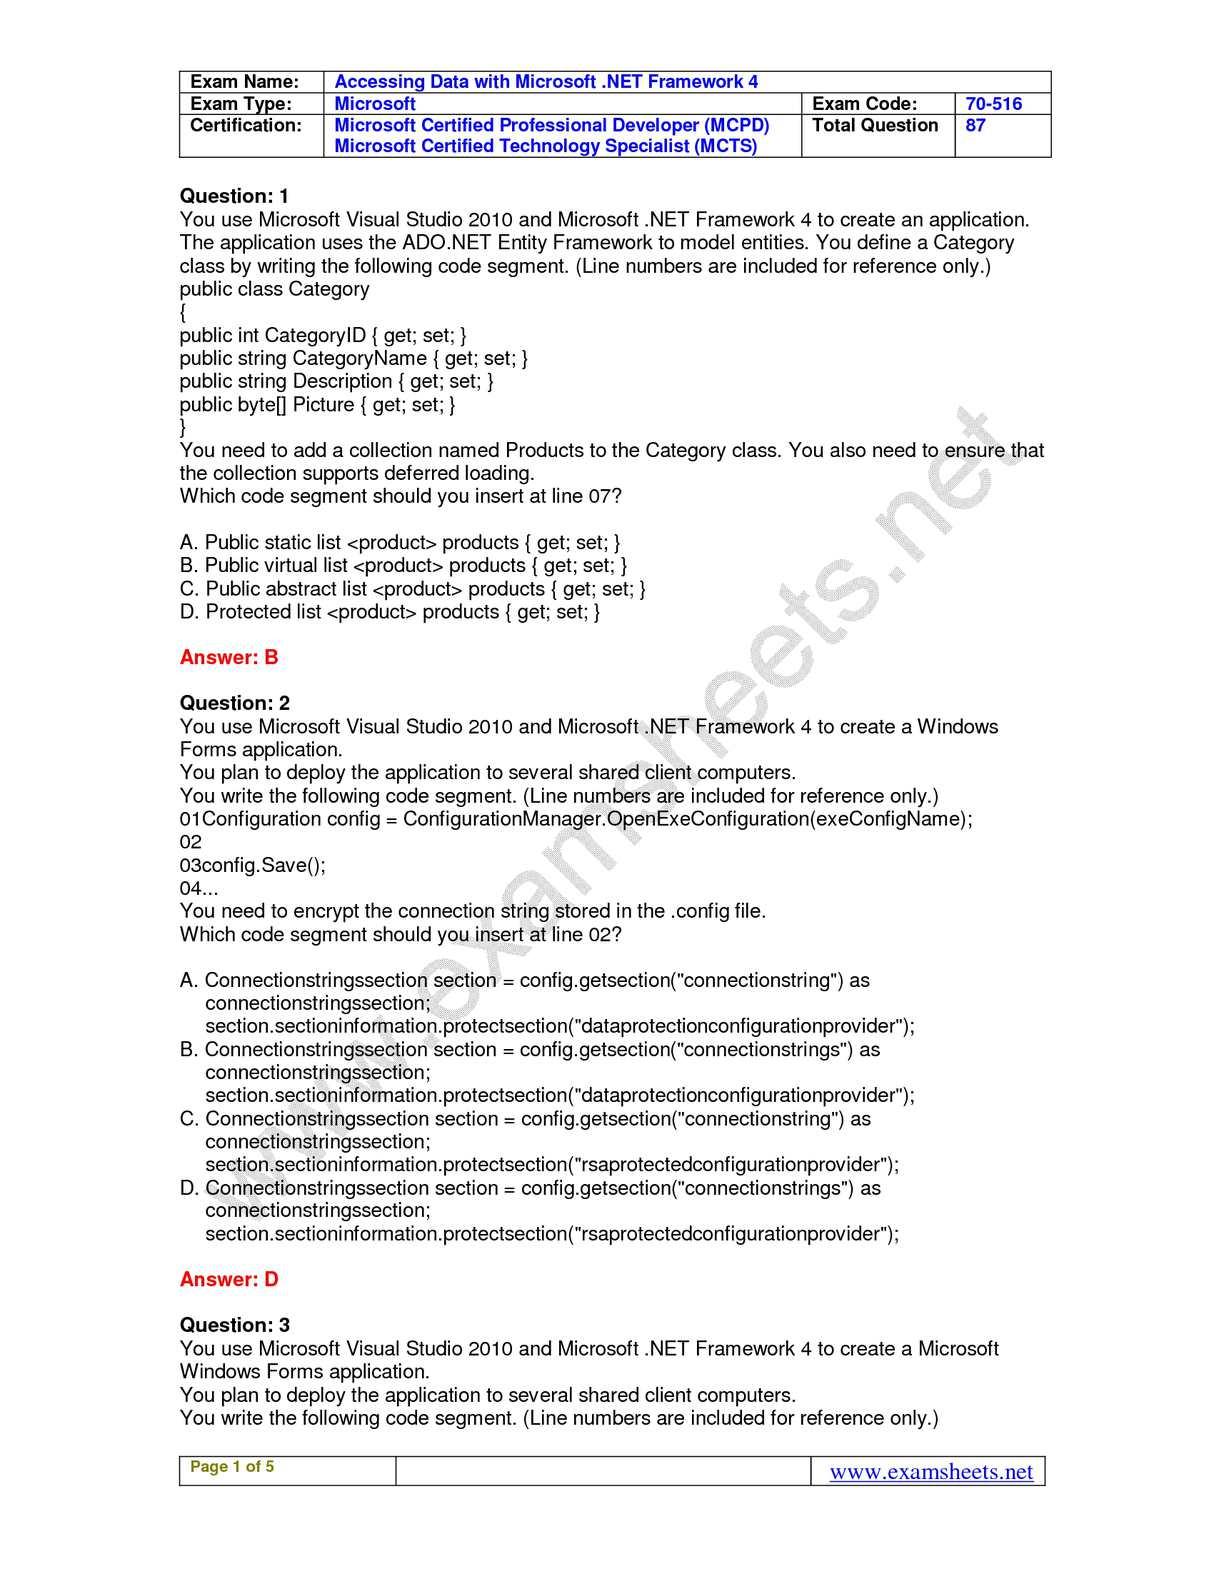 Calaméo - Exam Sheets 70-516 Practice Exam Questions - Microsoft 70